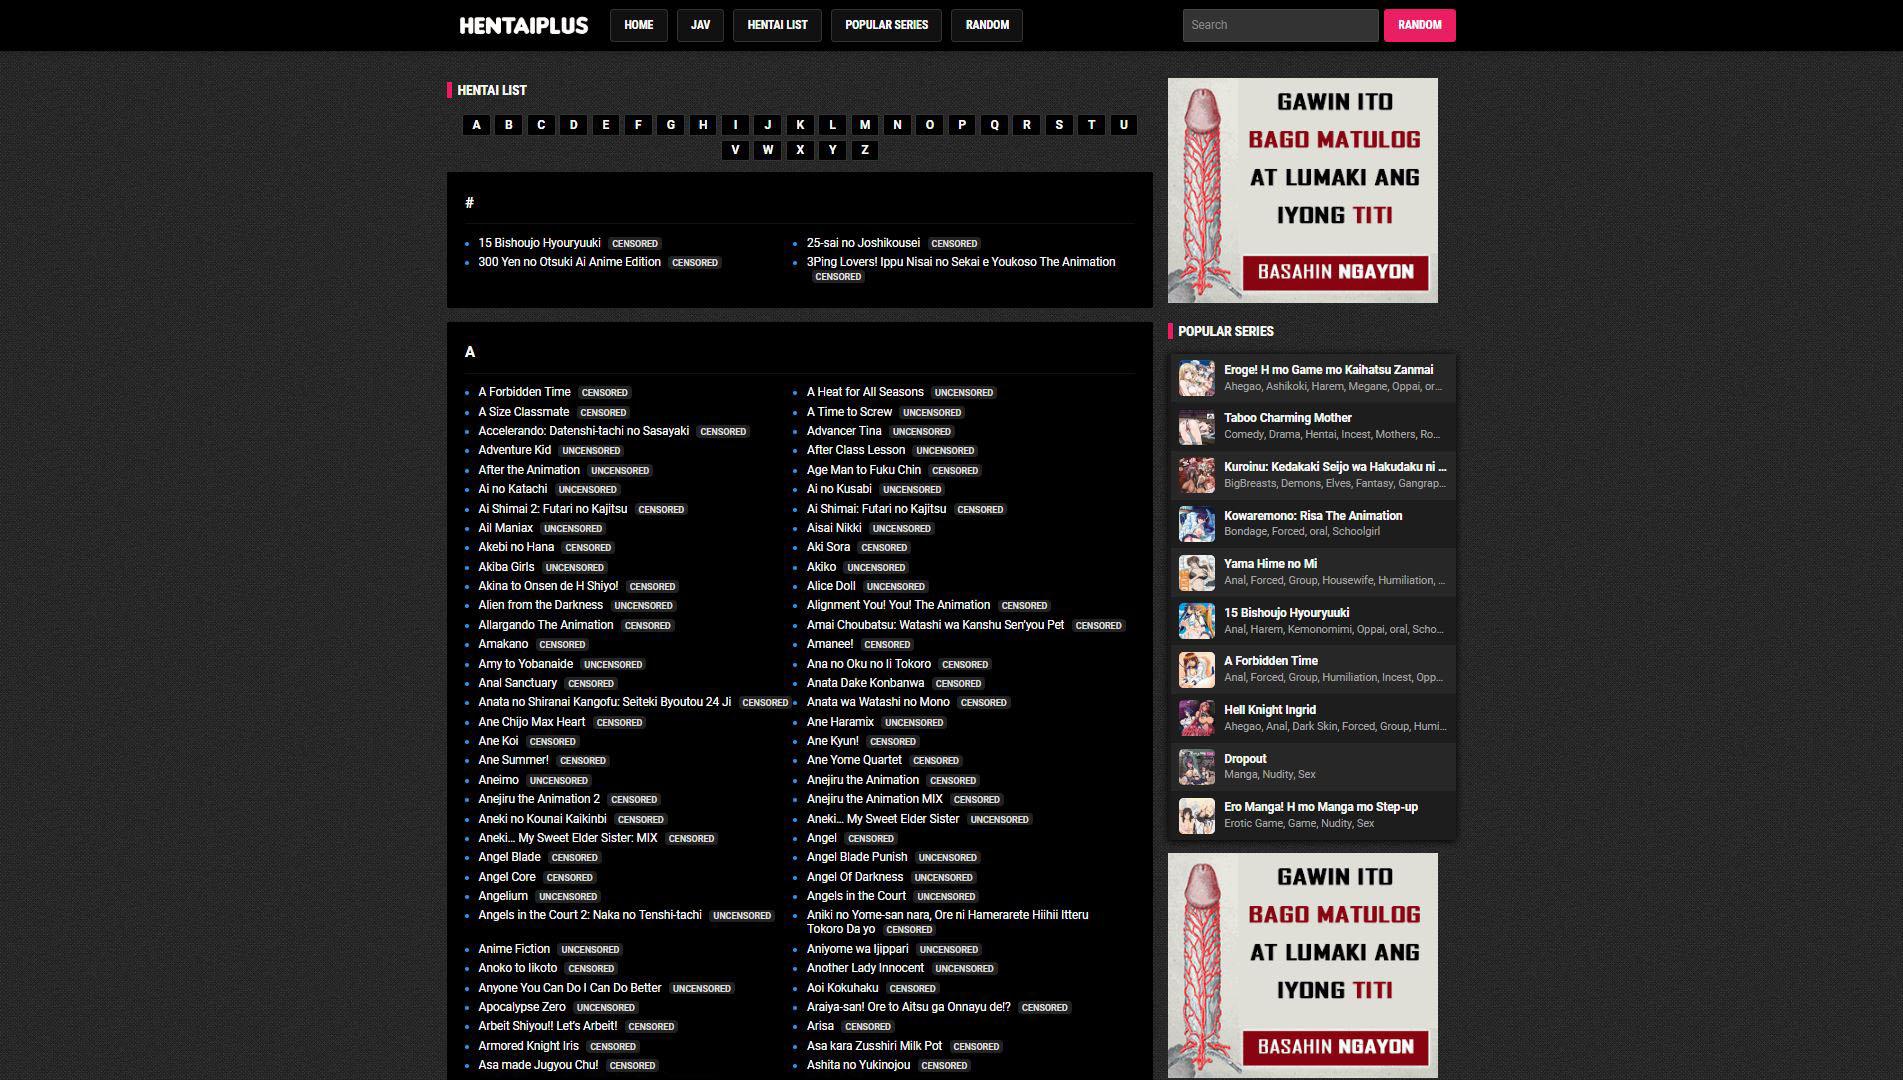 HentaiPlus Hentai List